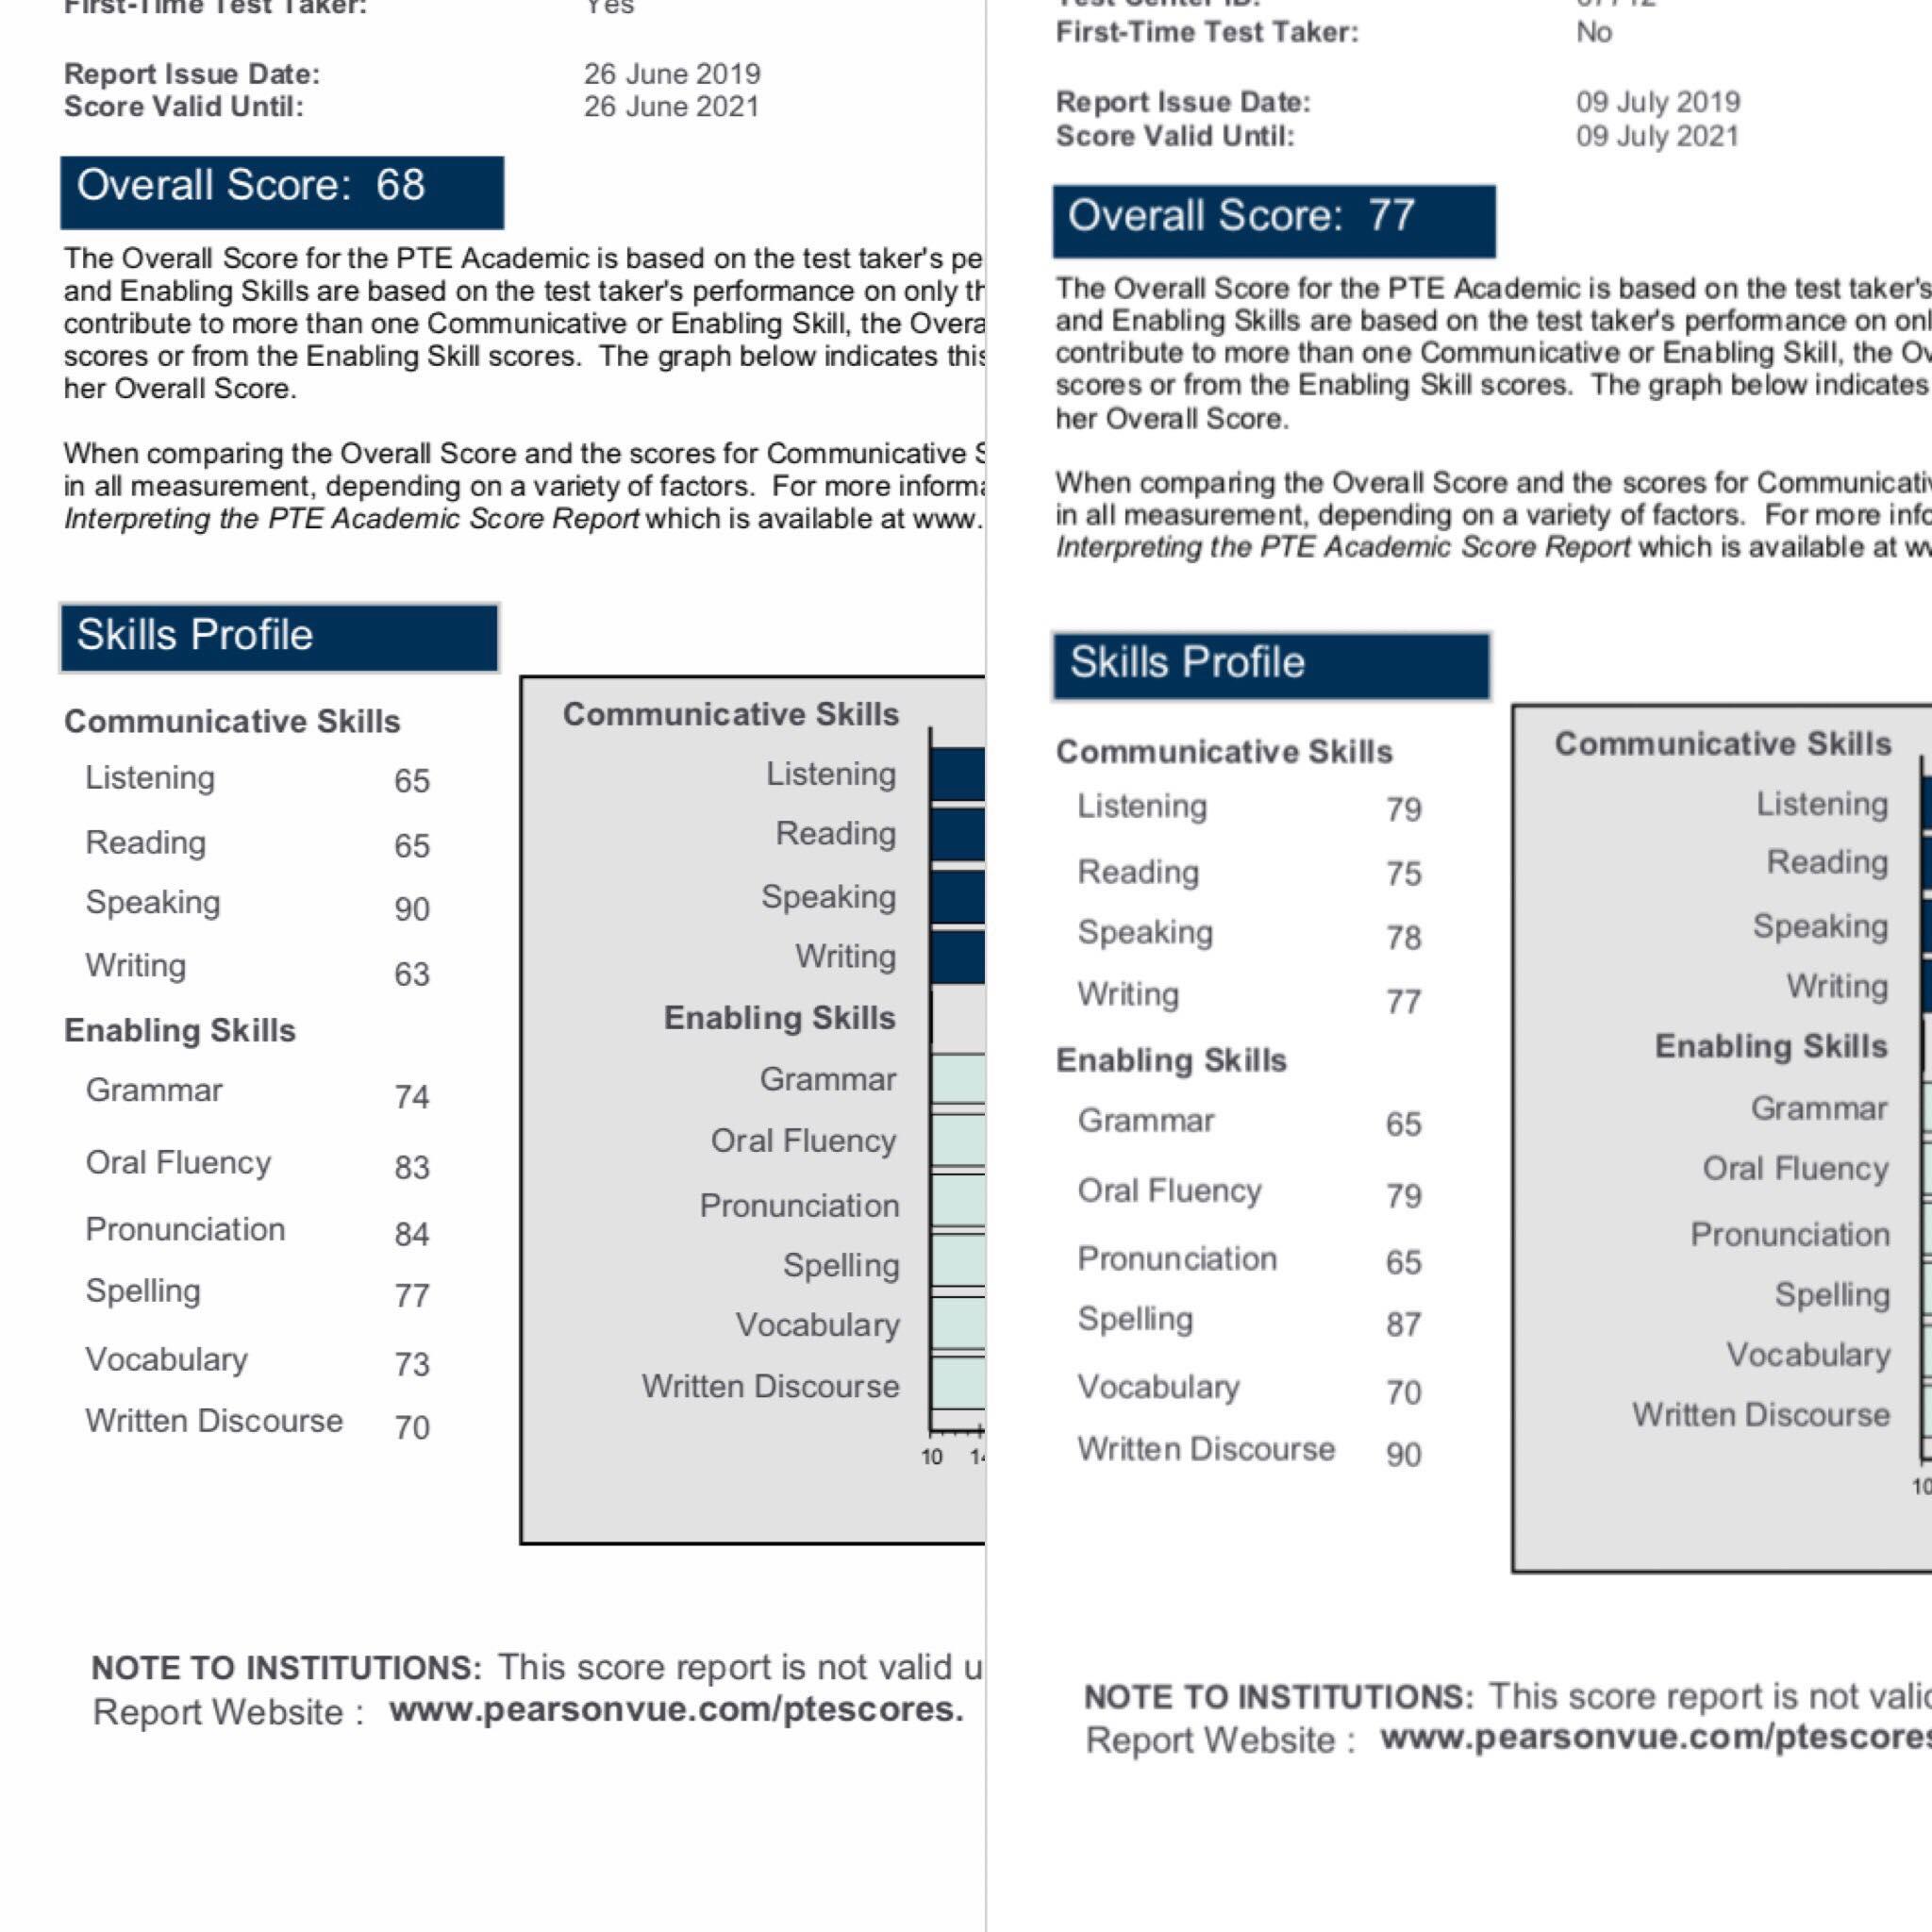 PTE一对一辅导- 澳洲校园- 新闻,招聘,汽车,二手,租房,交友,宠物